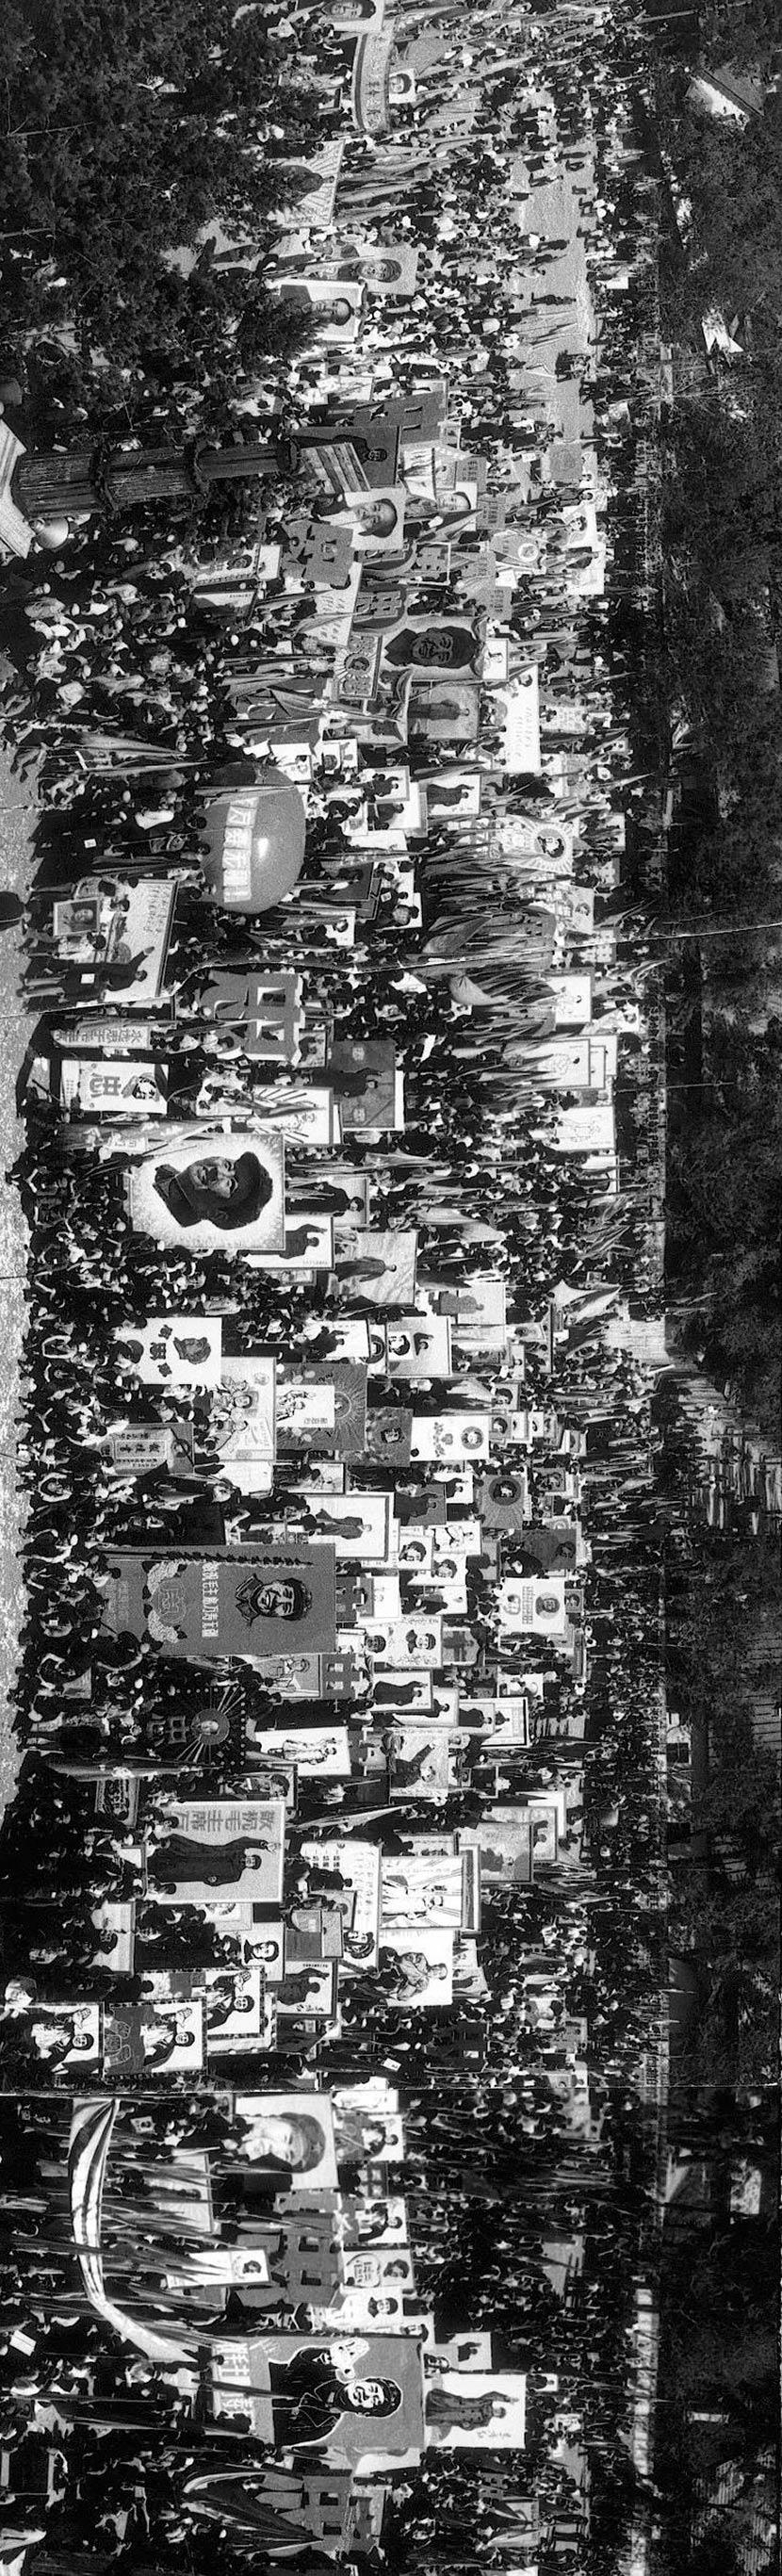 A view of people holding Chairman Mao's portraits in Harbin, Heilongjiang province, June 21, 1968. Li Zhensheng/The Chinese University of Hong Kong Press